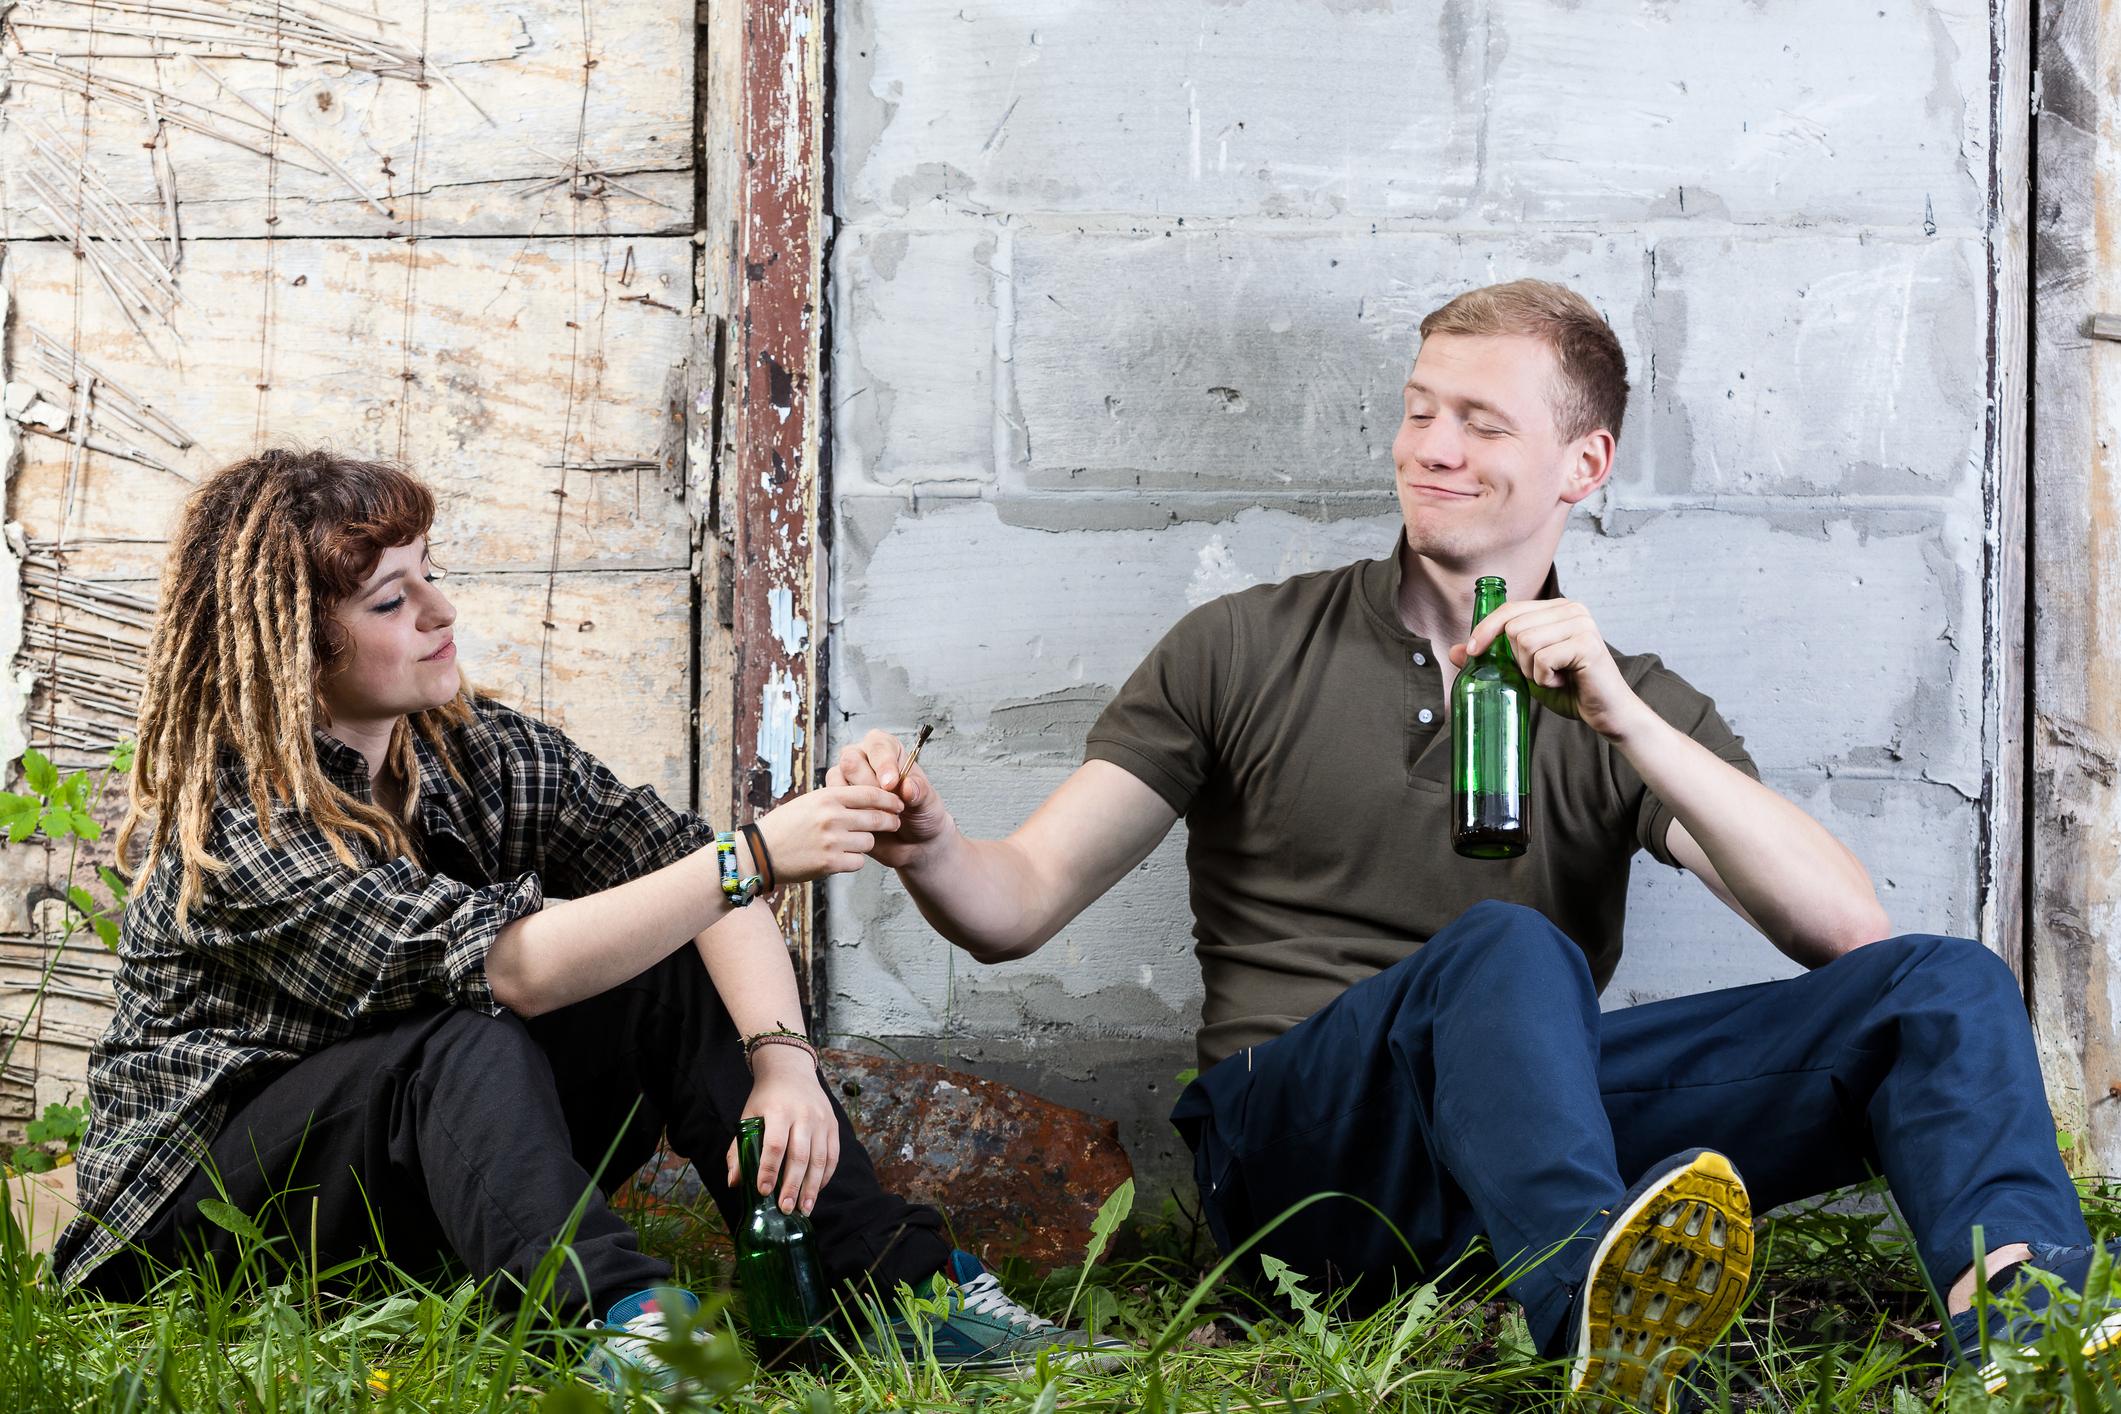 A man and woman sharing beer and marijuana outside.